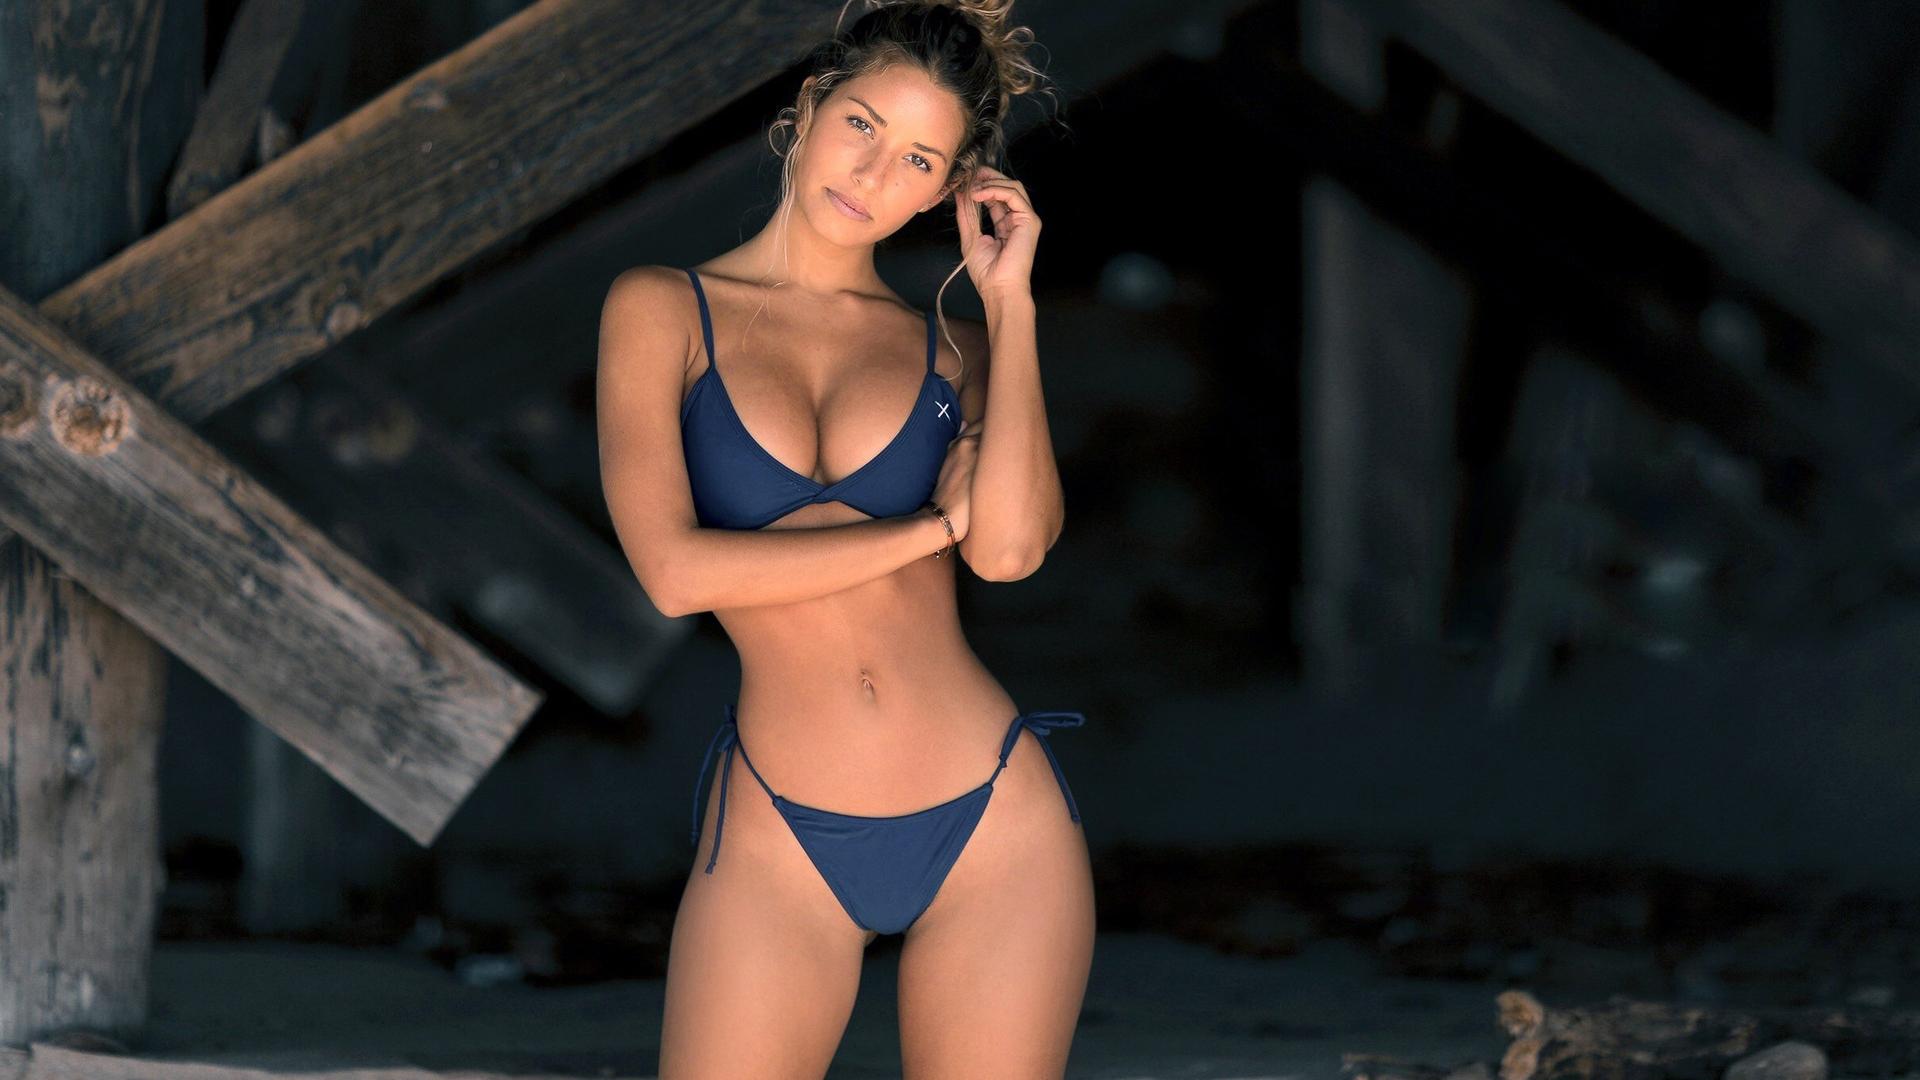 People 1920x1080 brunette blue bikinis model Sierra Skye women the gap BoutineLA bikini big boobs cleavage